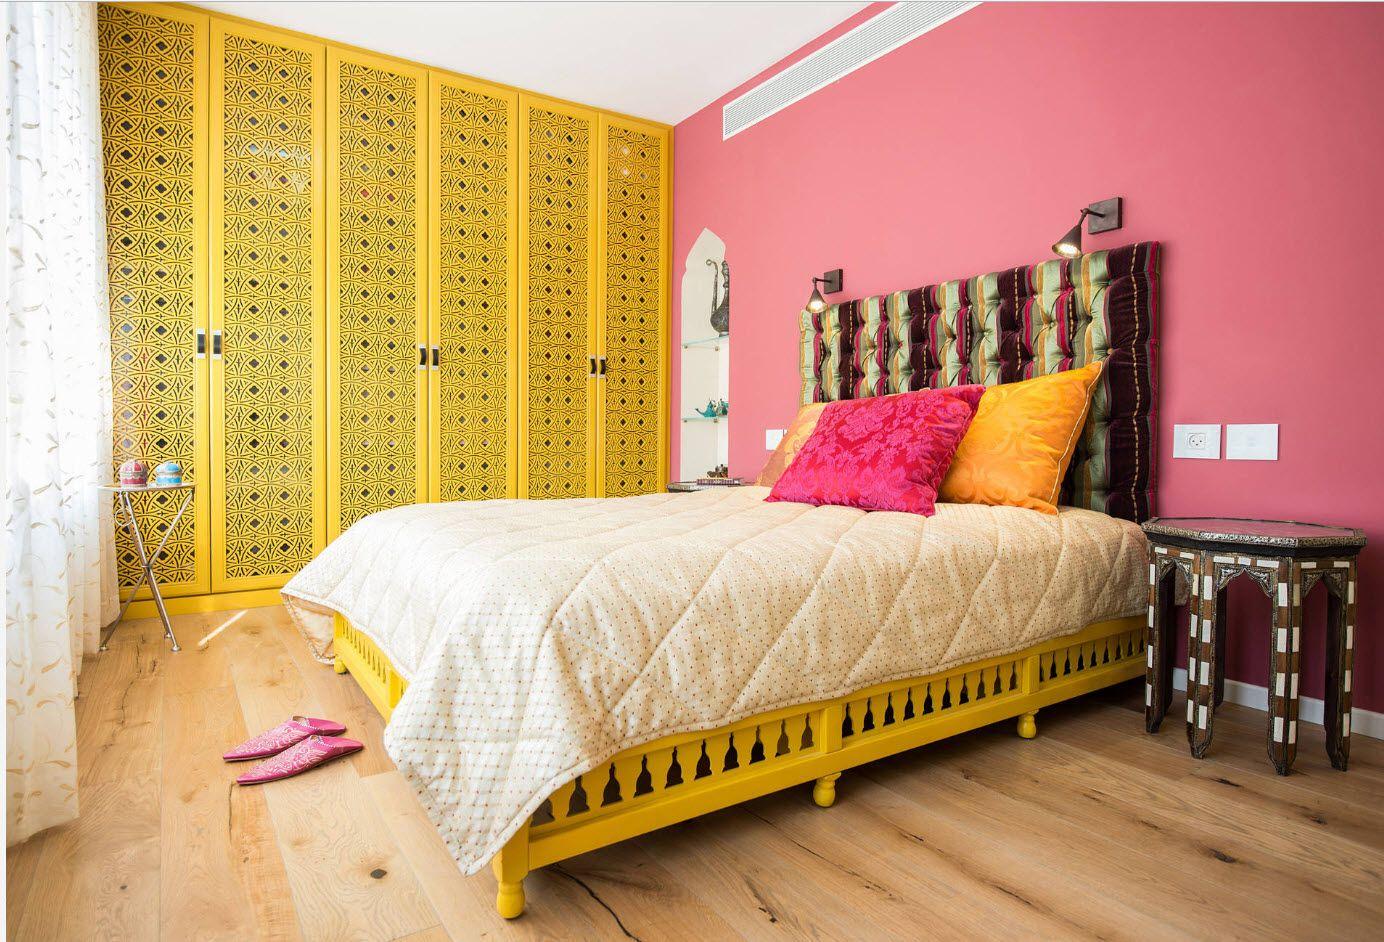 Modern Bedroom Interior Decoration & Design Ideas 2017. Pop-art color palette